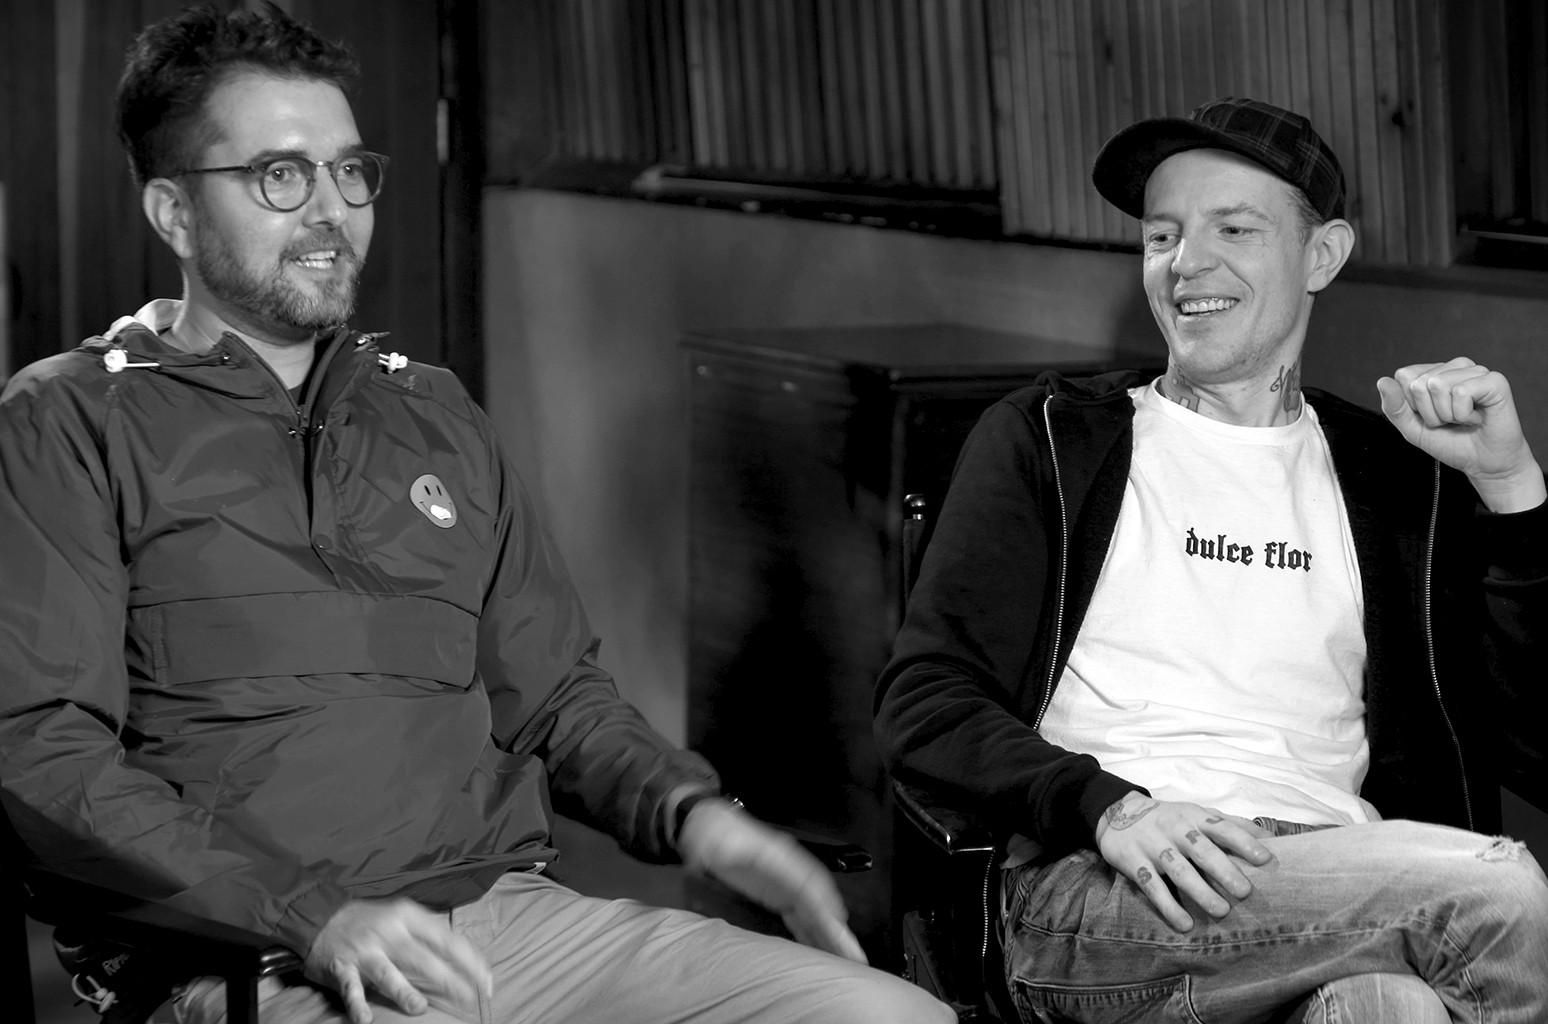 Joel Zimmerman Deadmau5 and Gregory Reveret